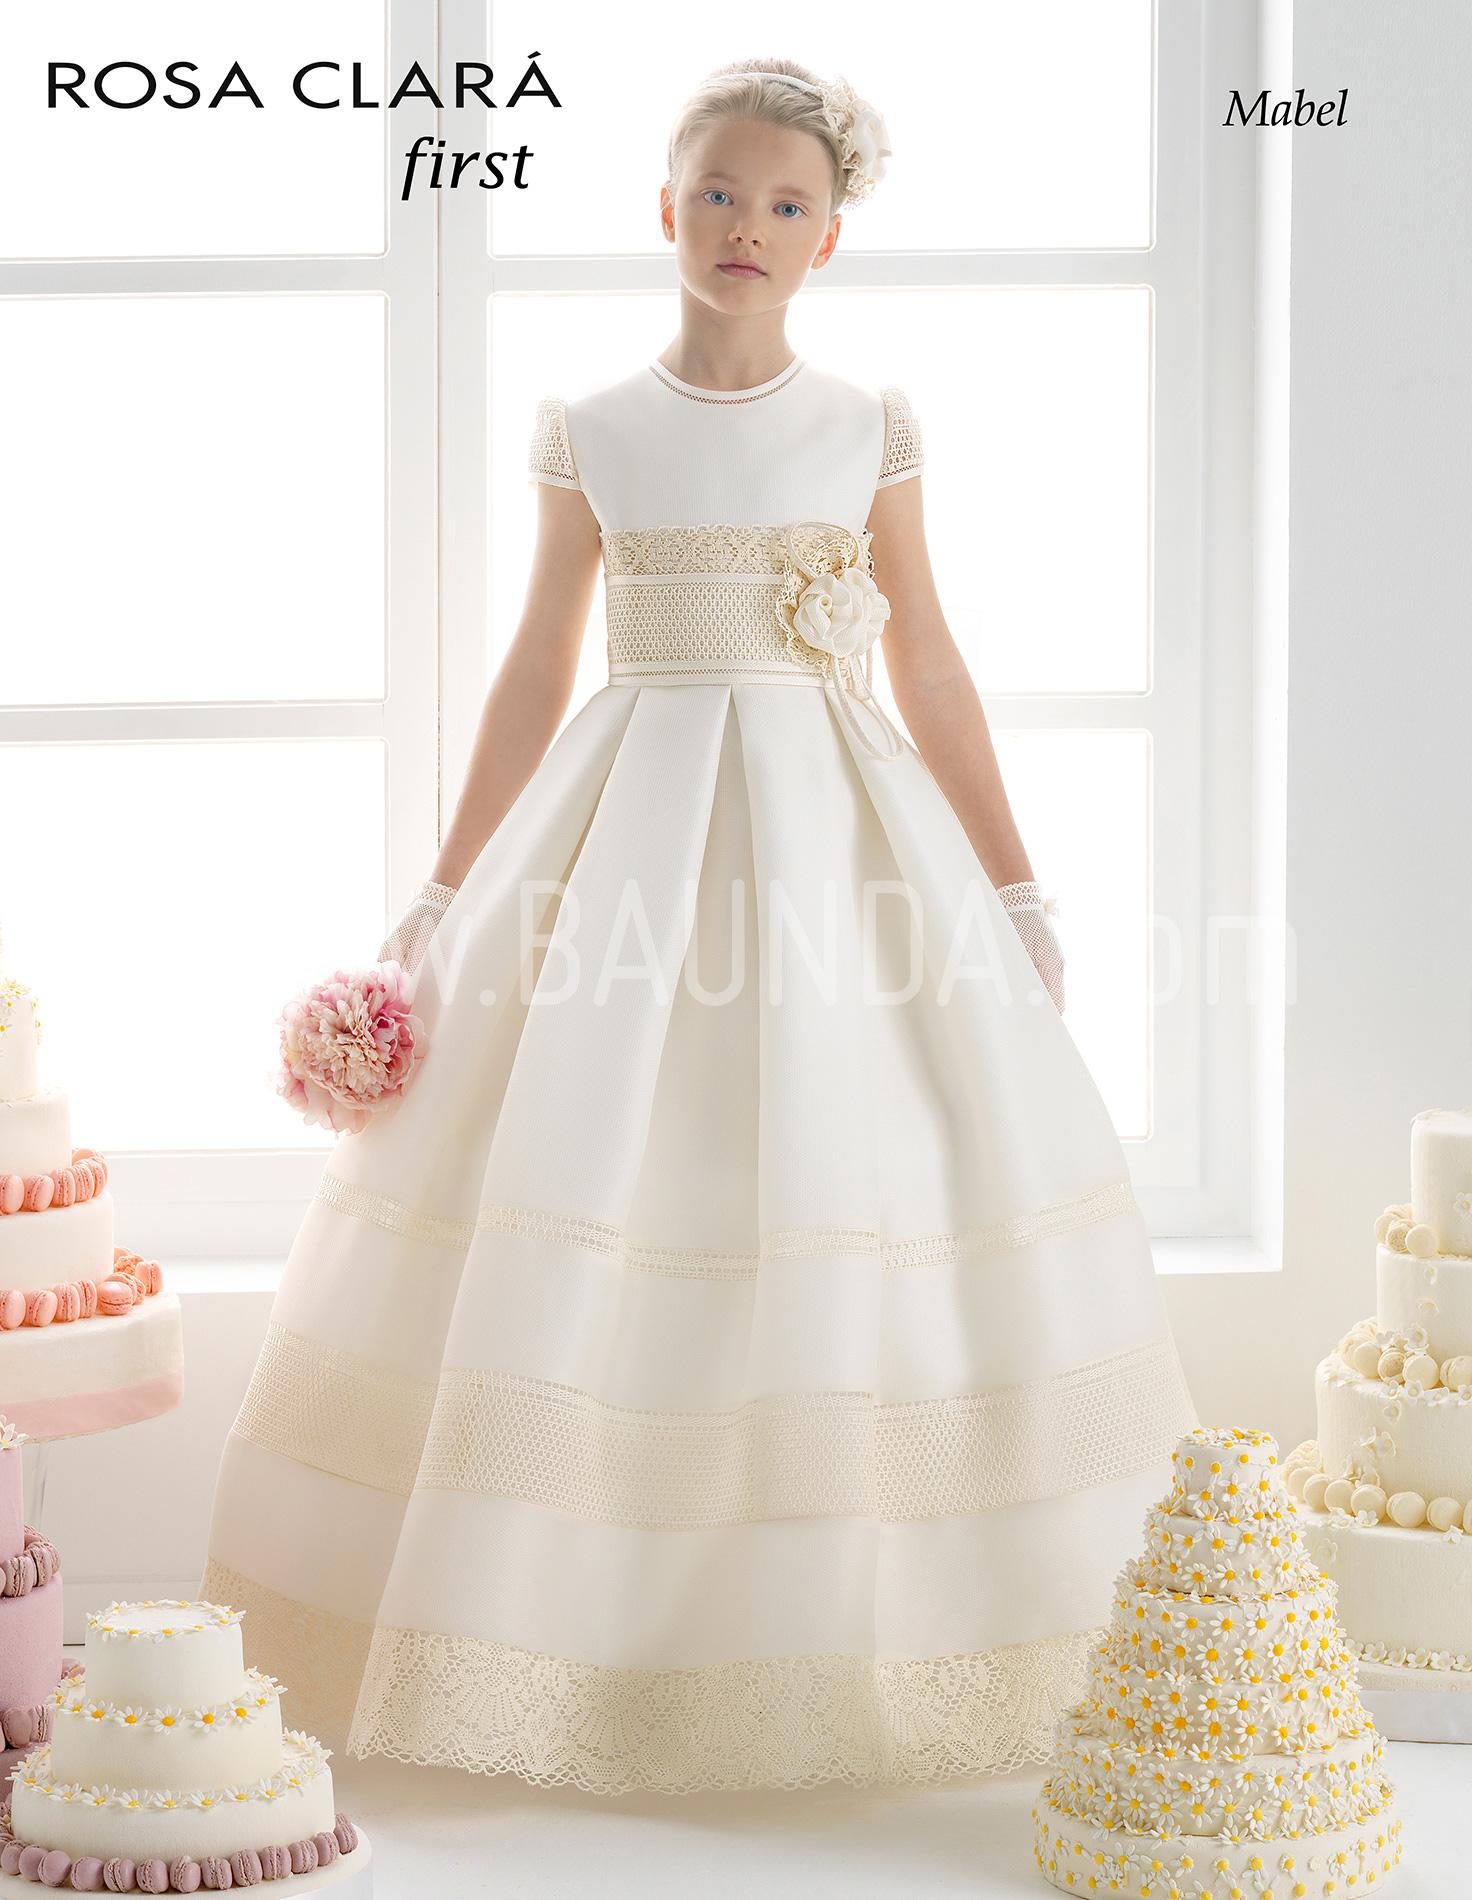 Fotos de vestidos de comunion rosa clara